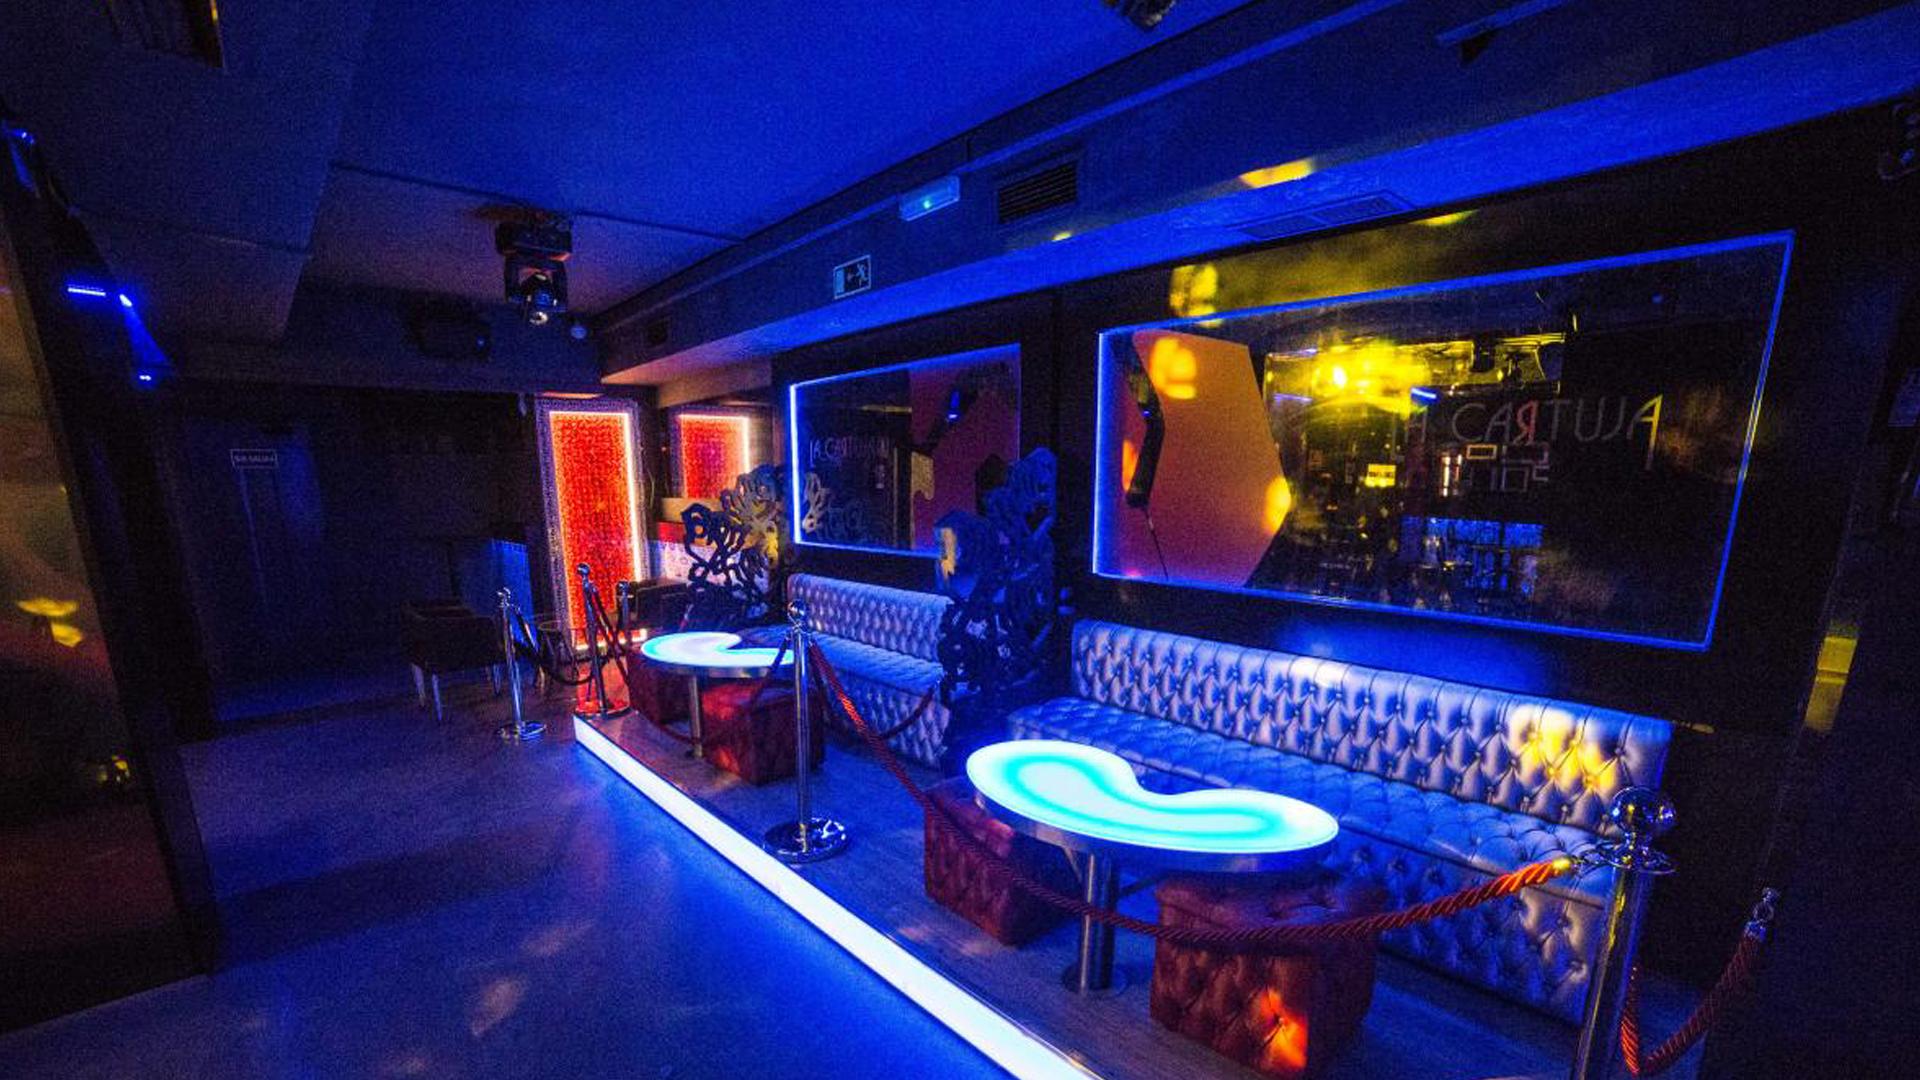 Miami-Dade reabrirá sus bares y discotecas